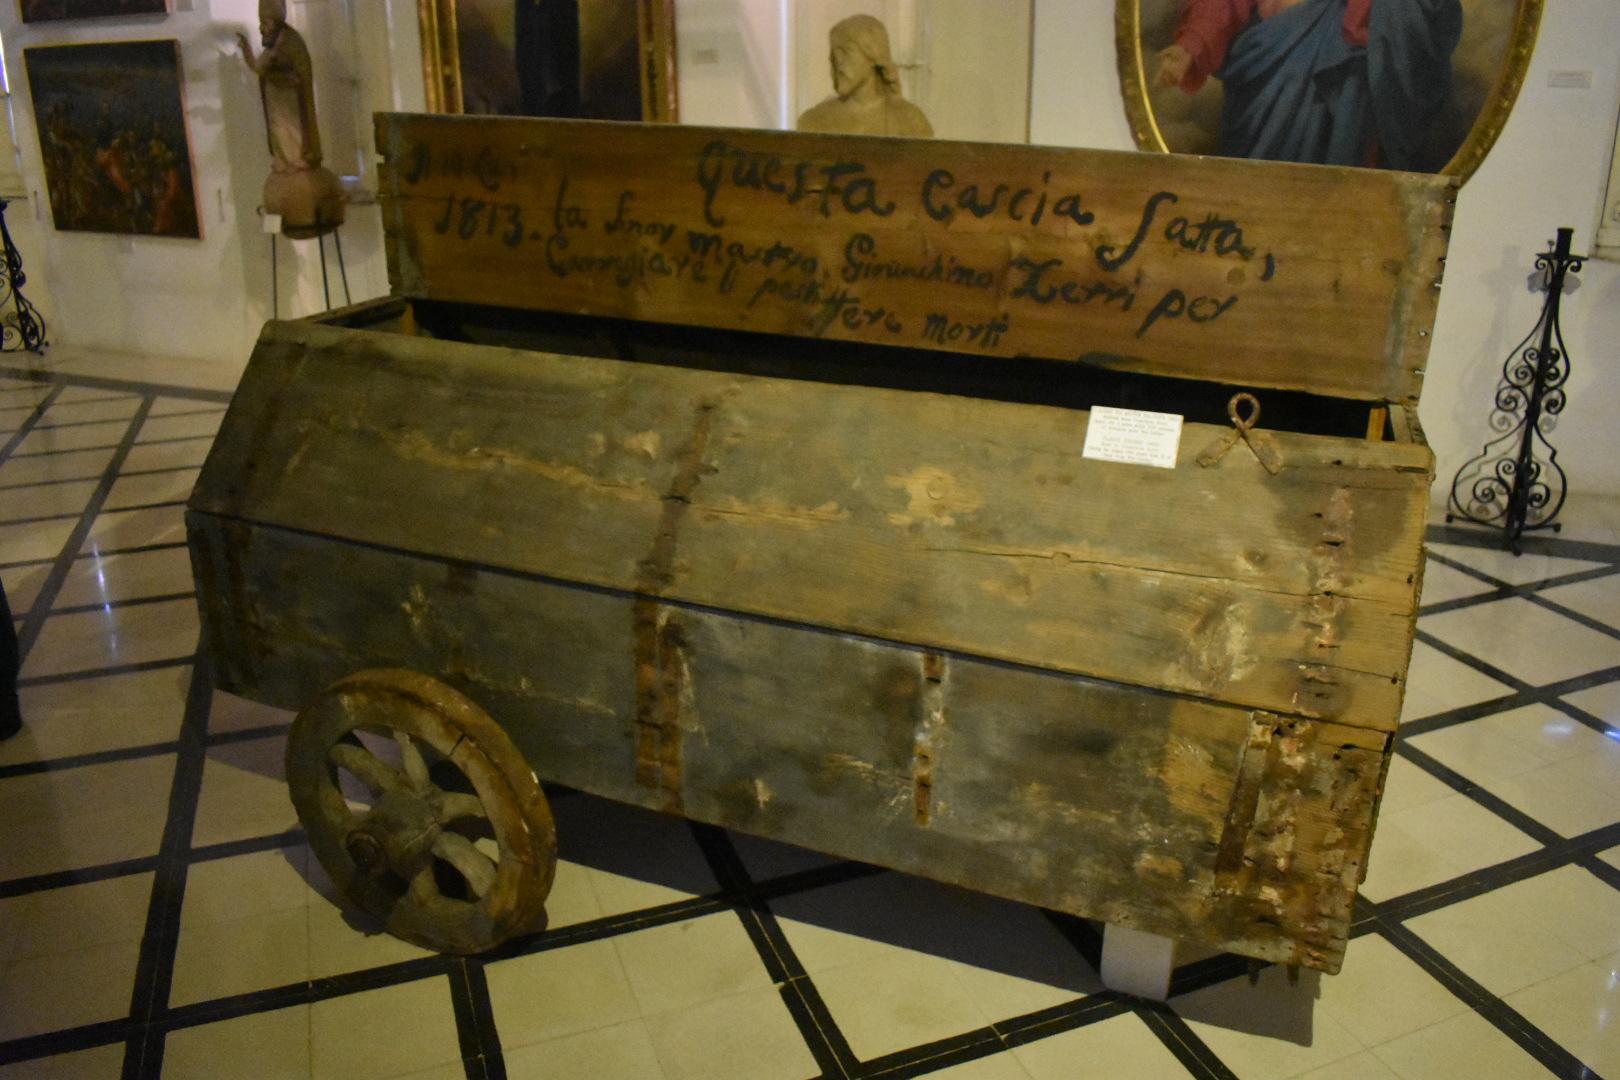 File:Rare dead cart at the Żabbar Sanctuary Museum.jpg - Wikimedia Commons